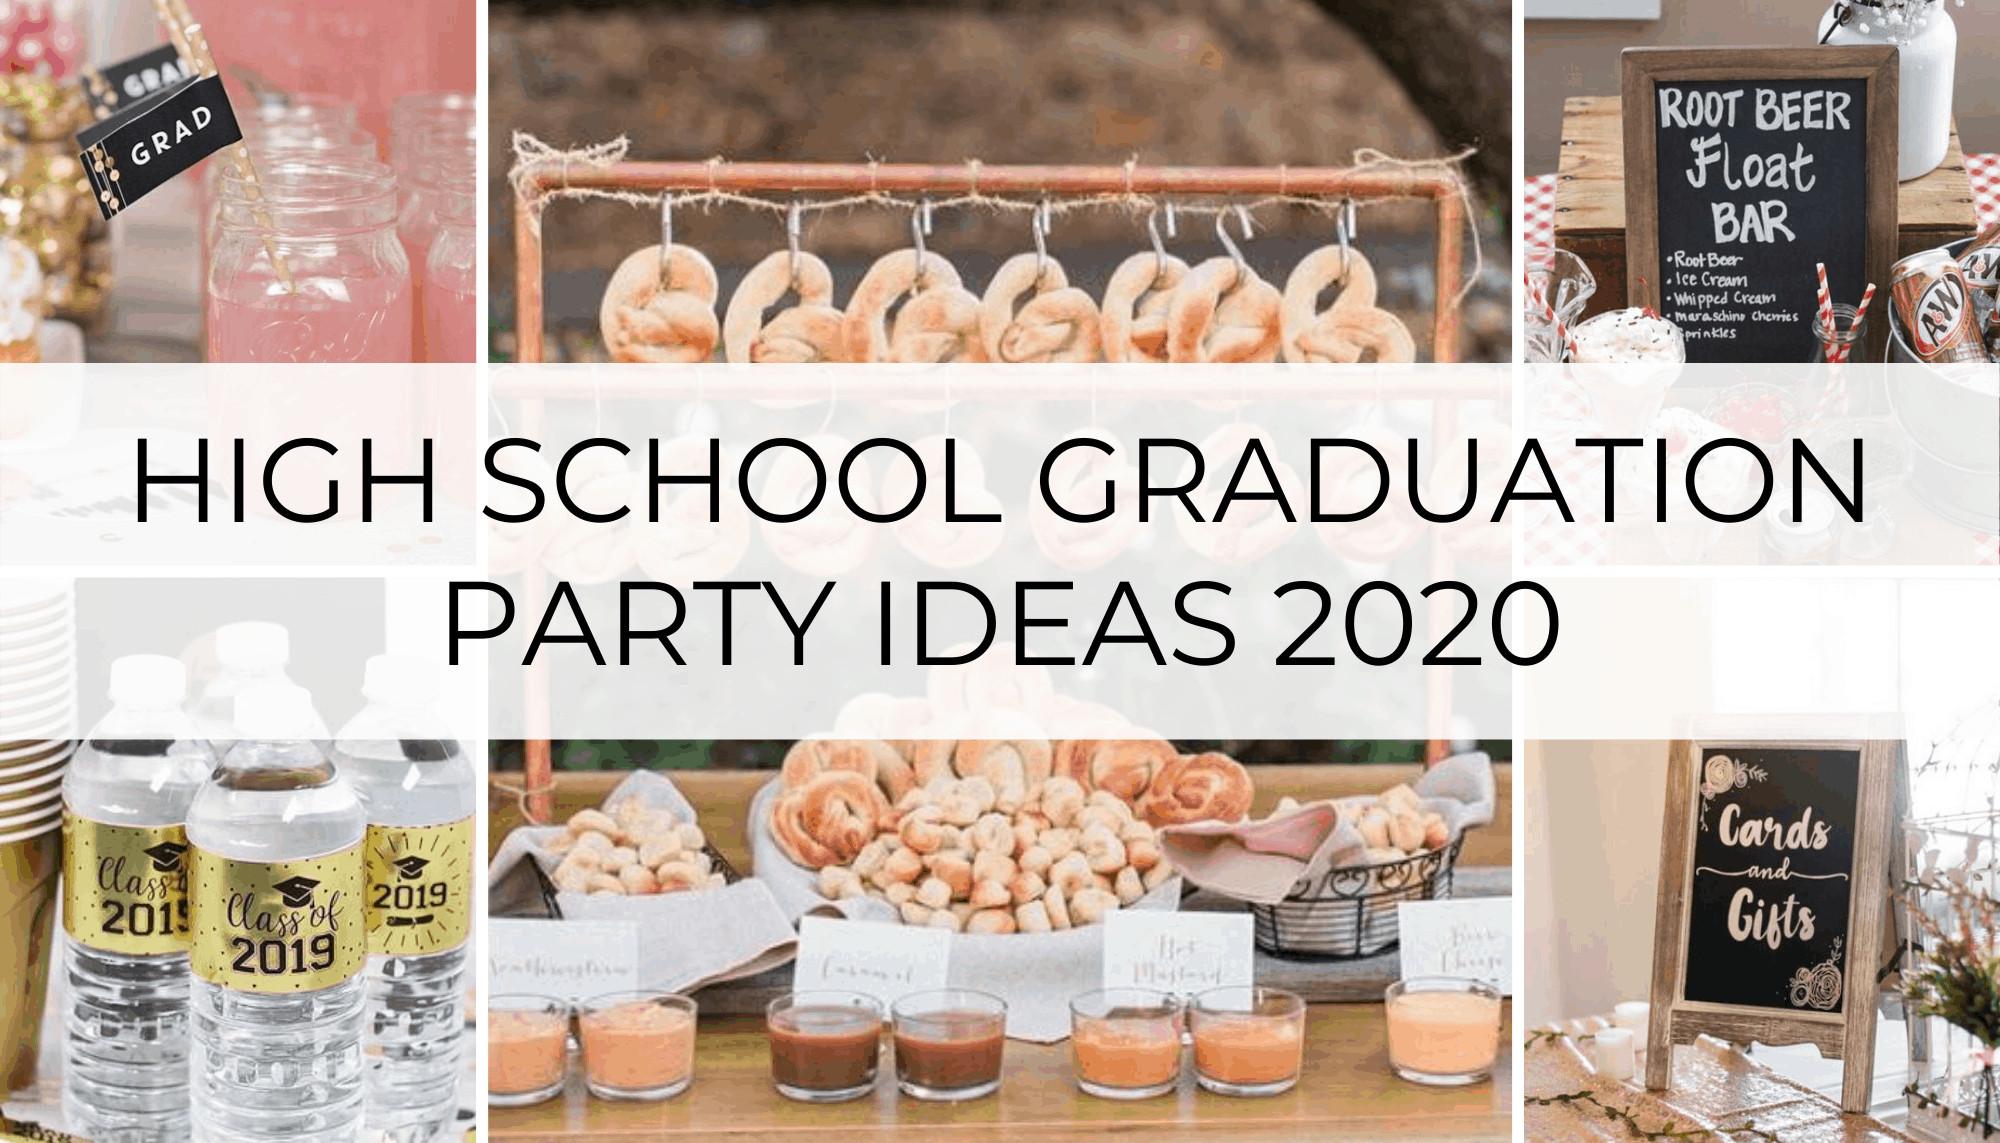 2020 Graduation Party Ideas  26 High School Graduation Party Ideas 2020 Graduates Will